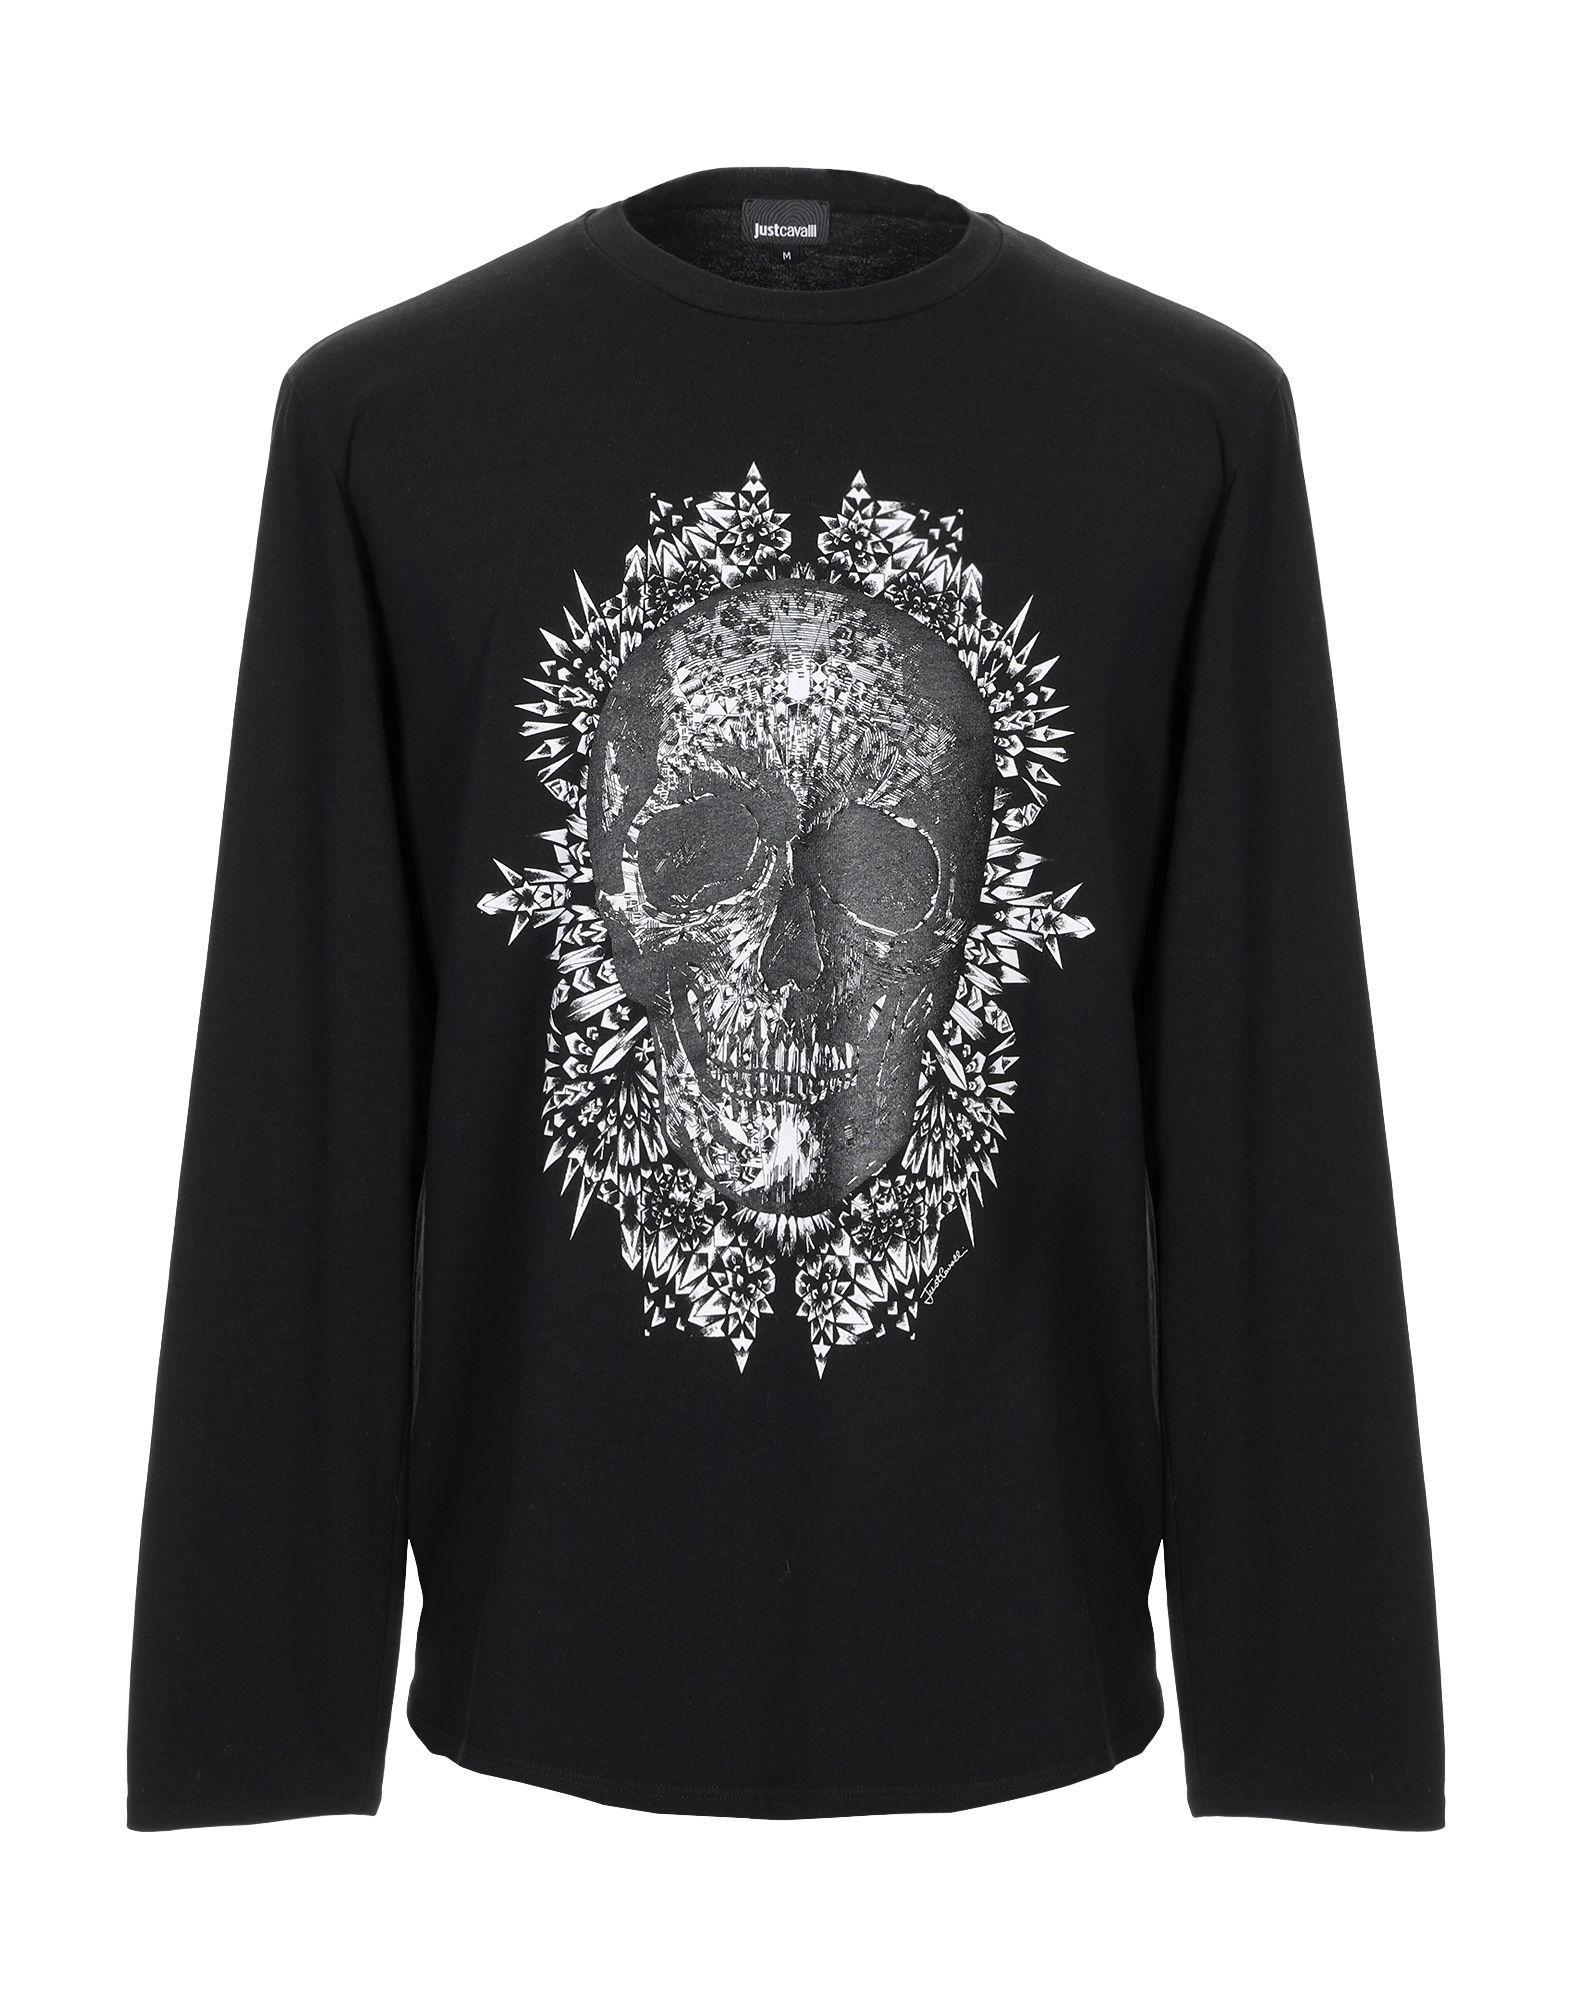 fe209b719 Just Cavalli T-shirt in Black for Men - Lyst